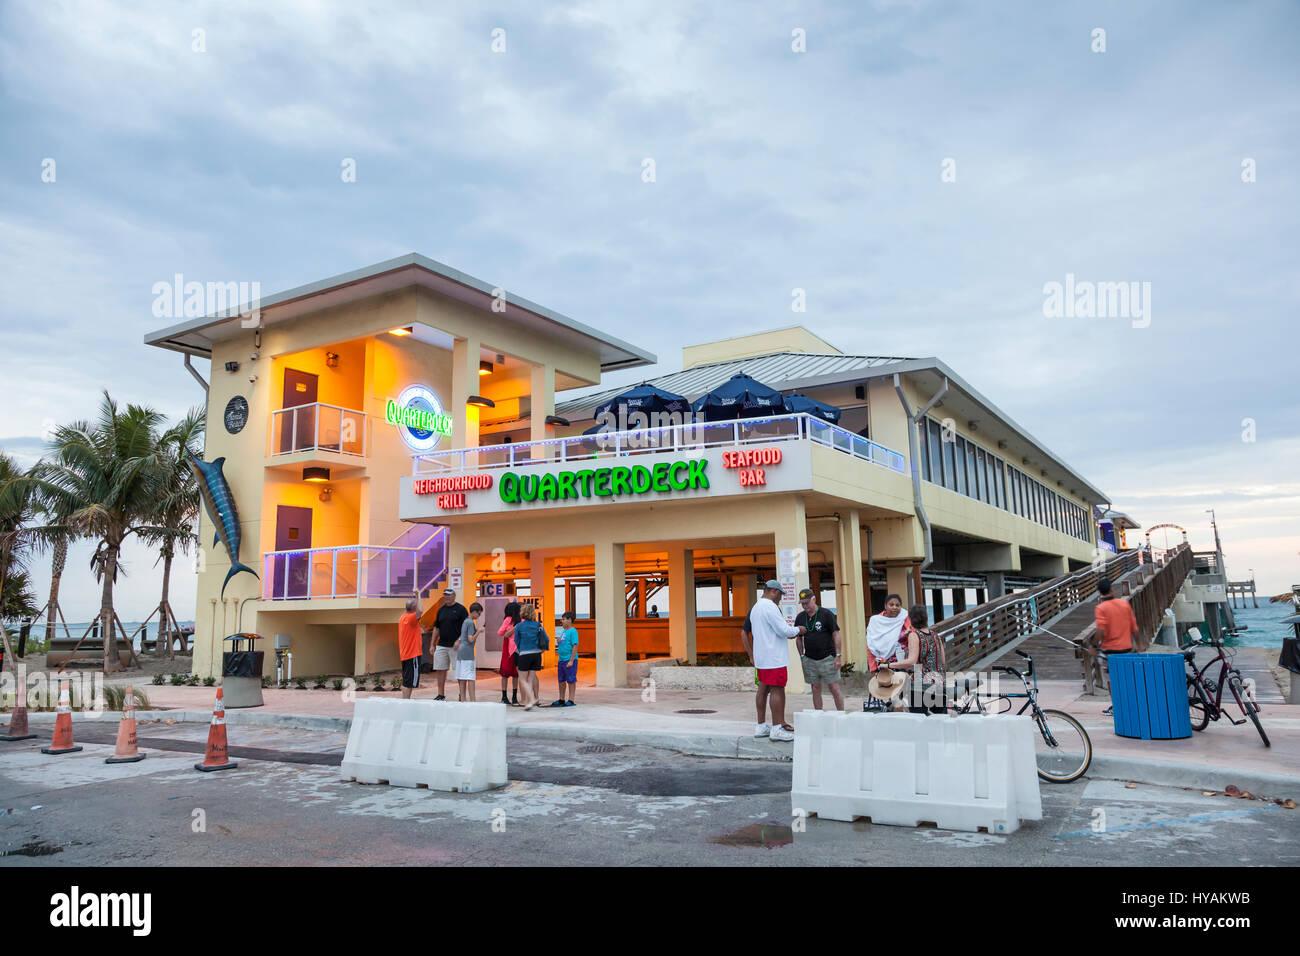 Florida Miami Dania Beach